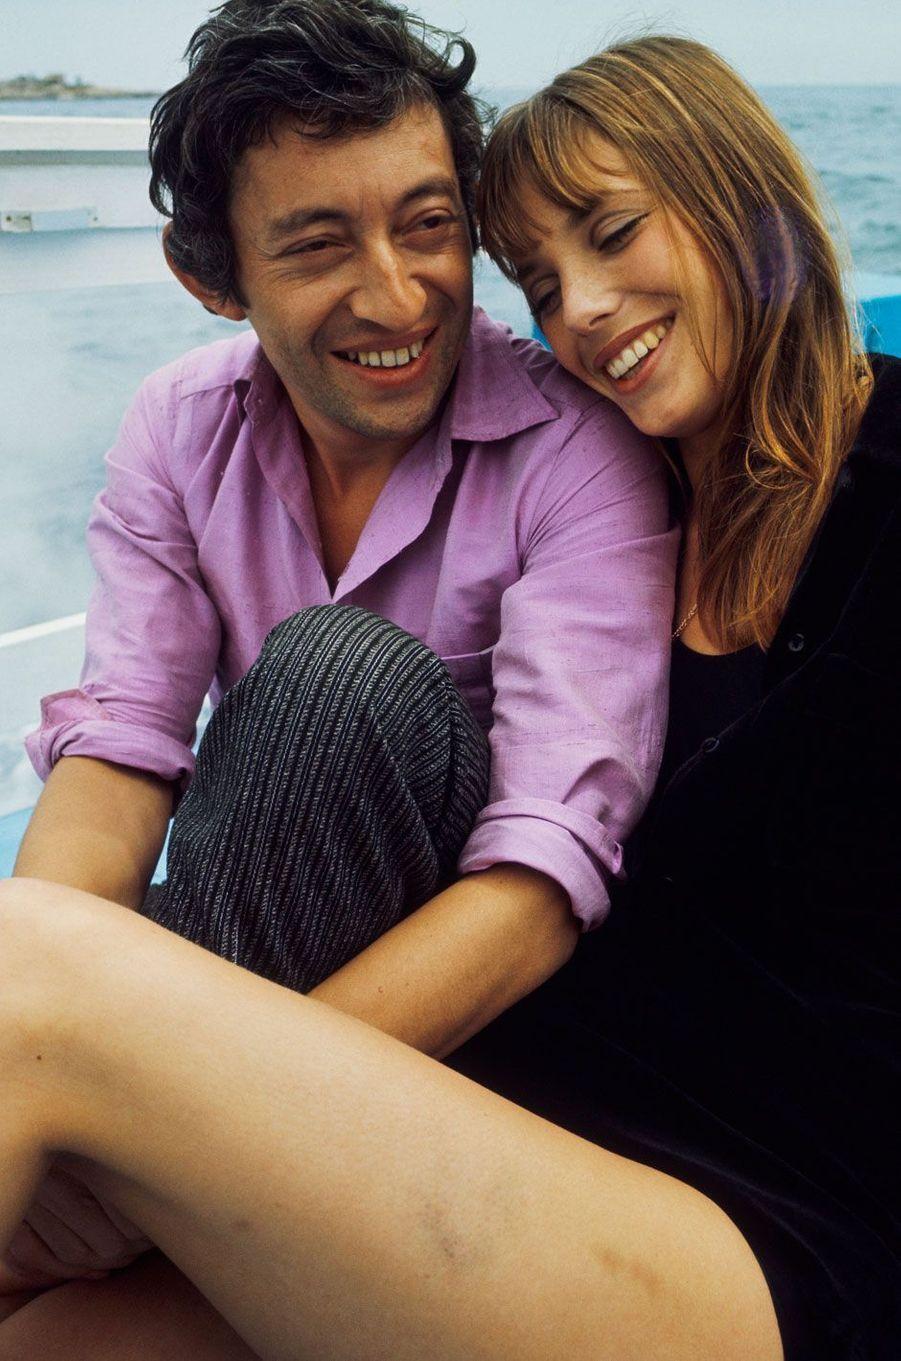 Serge Gainsbourg et Jane Birkin, amoureux.